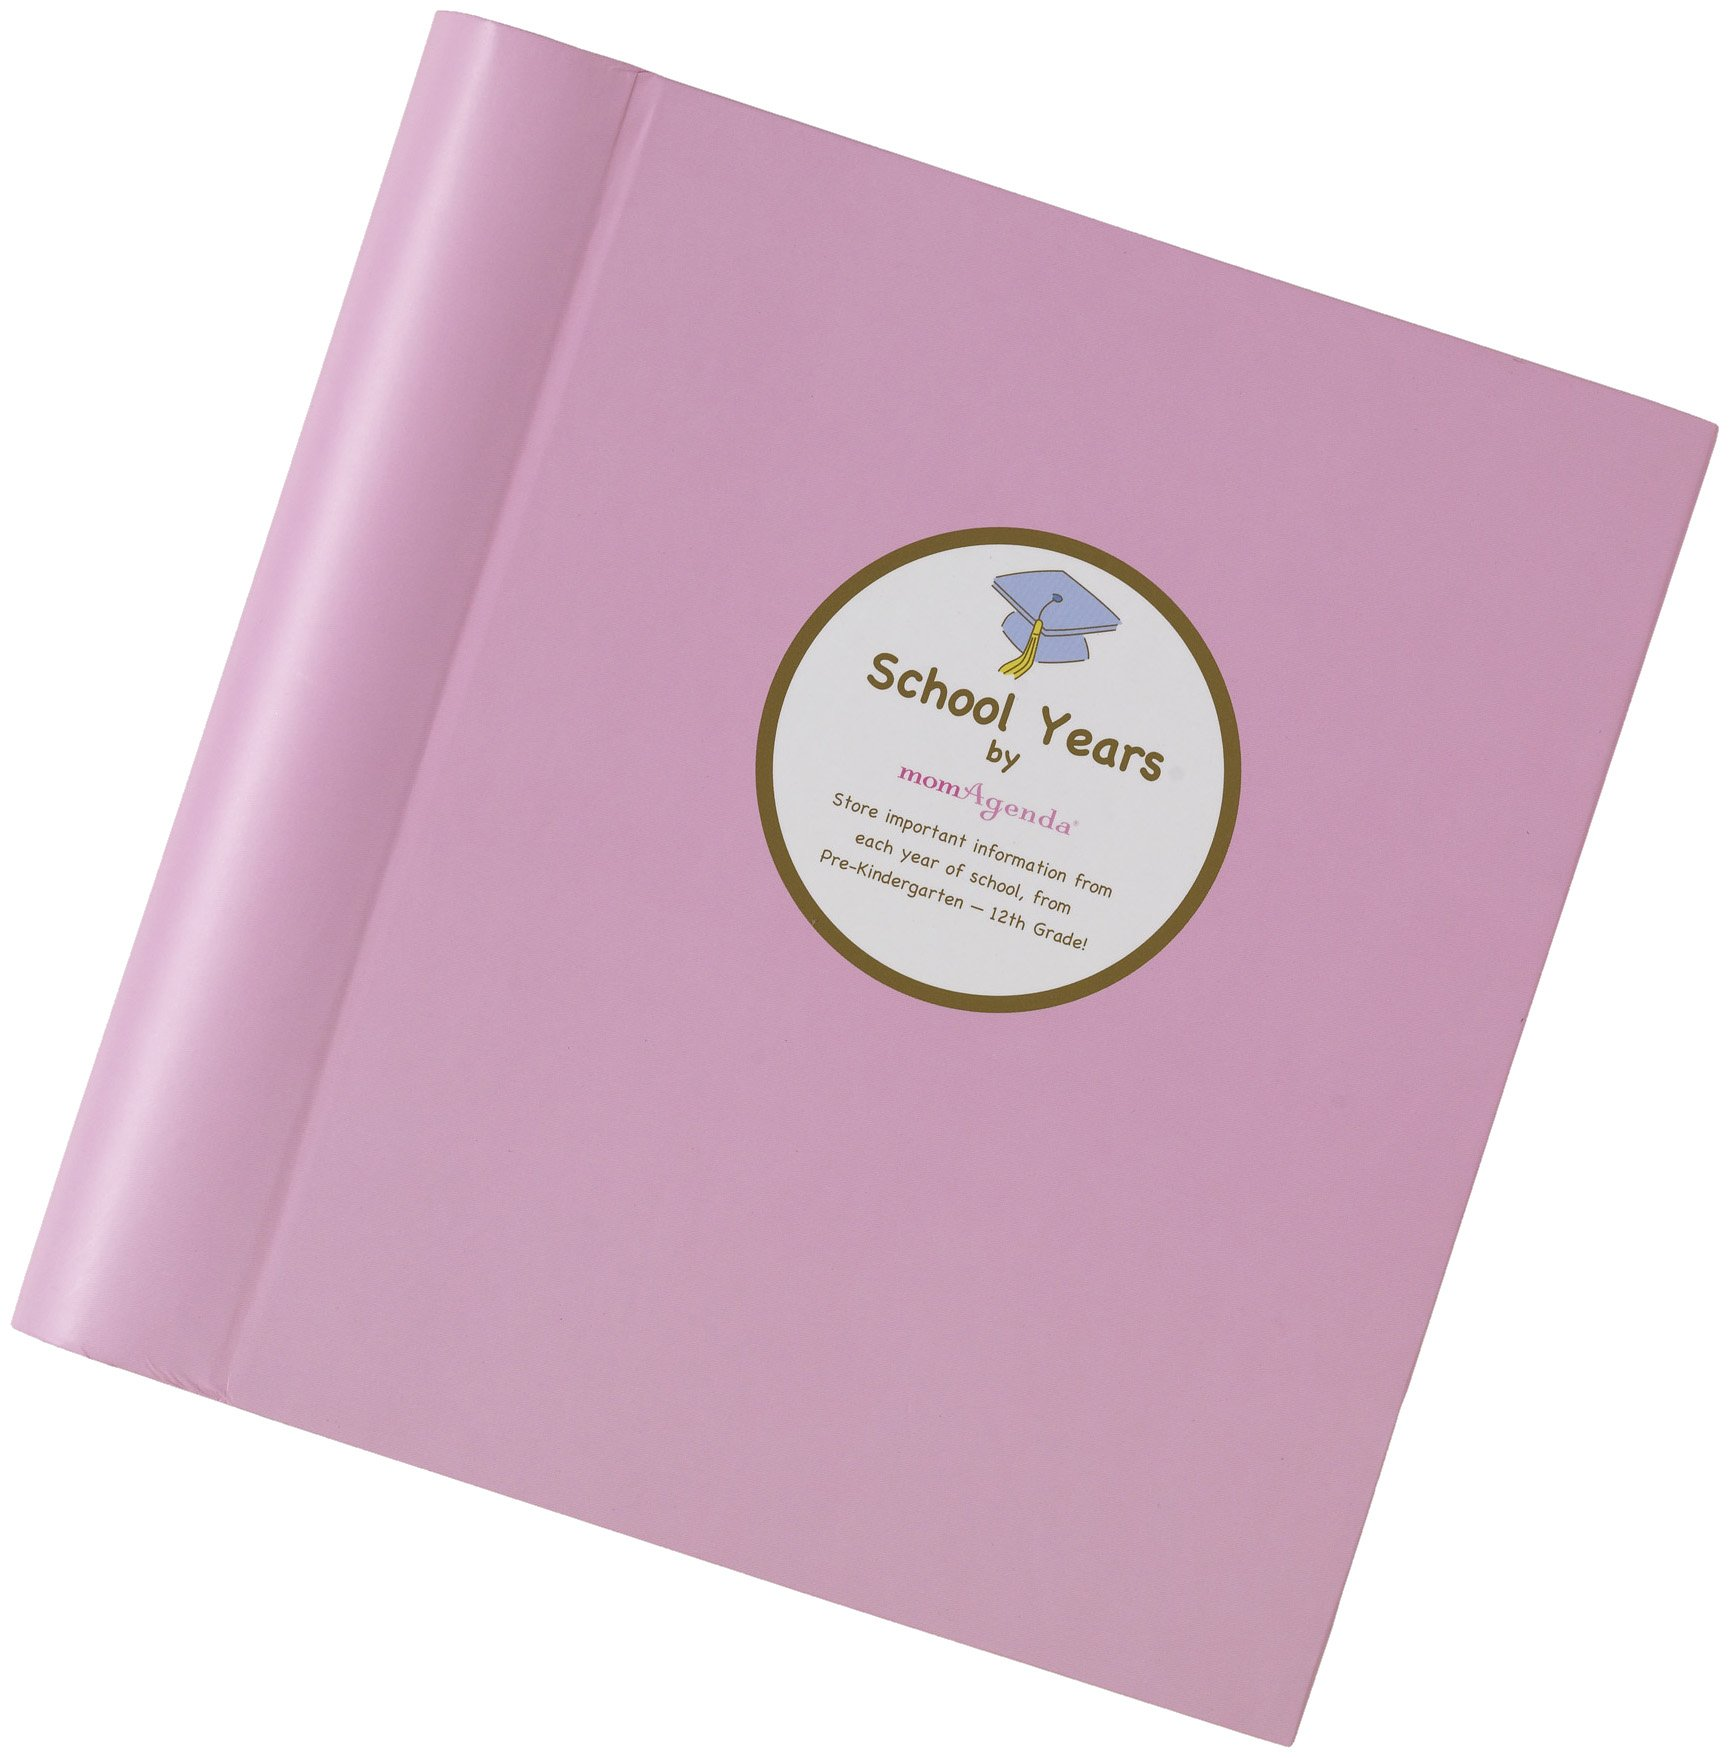 2011 momAgenda School Years - Rose pdf